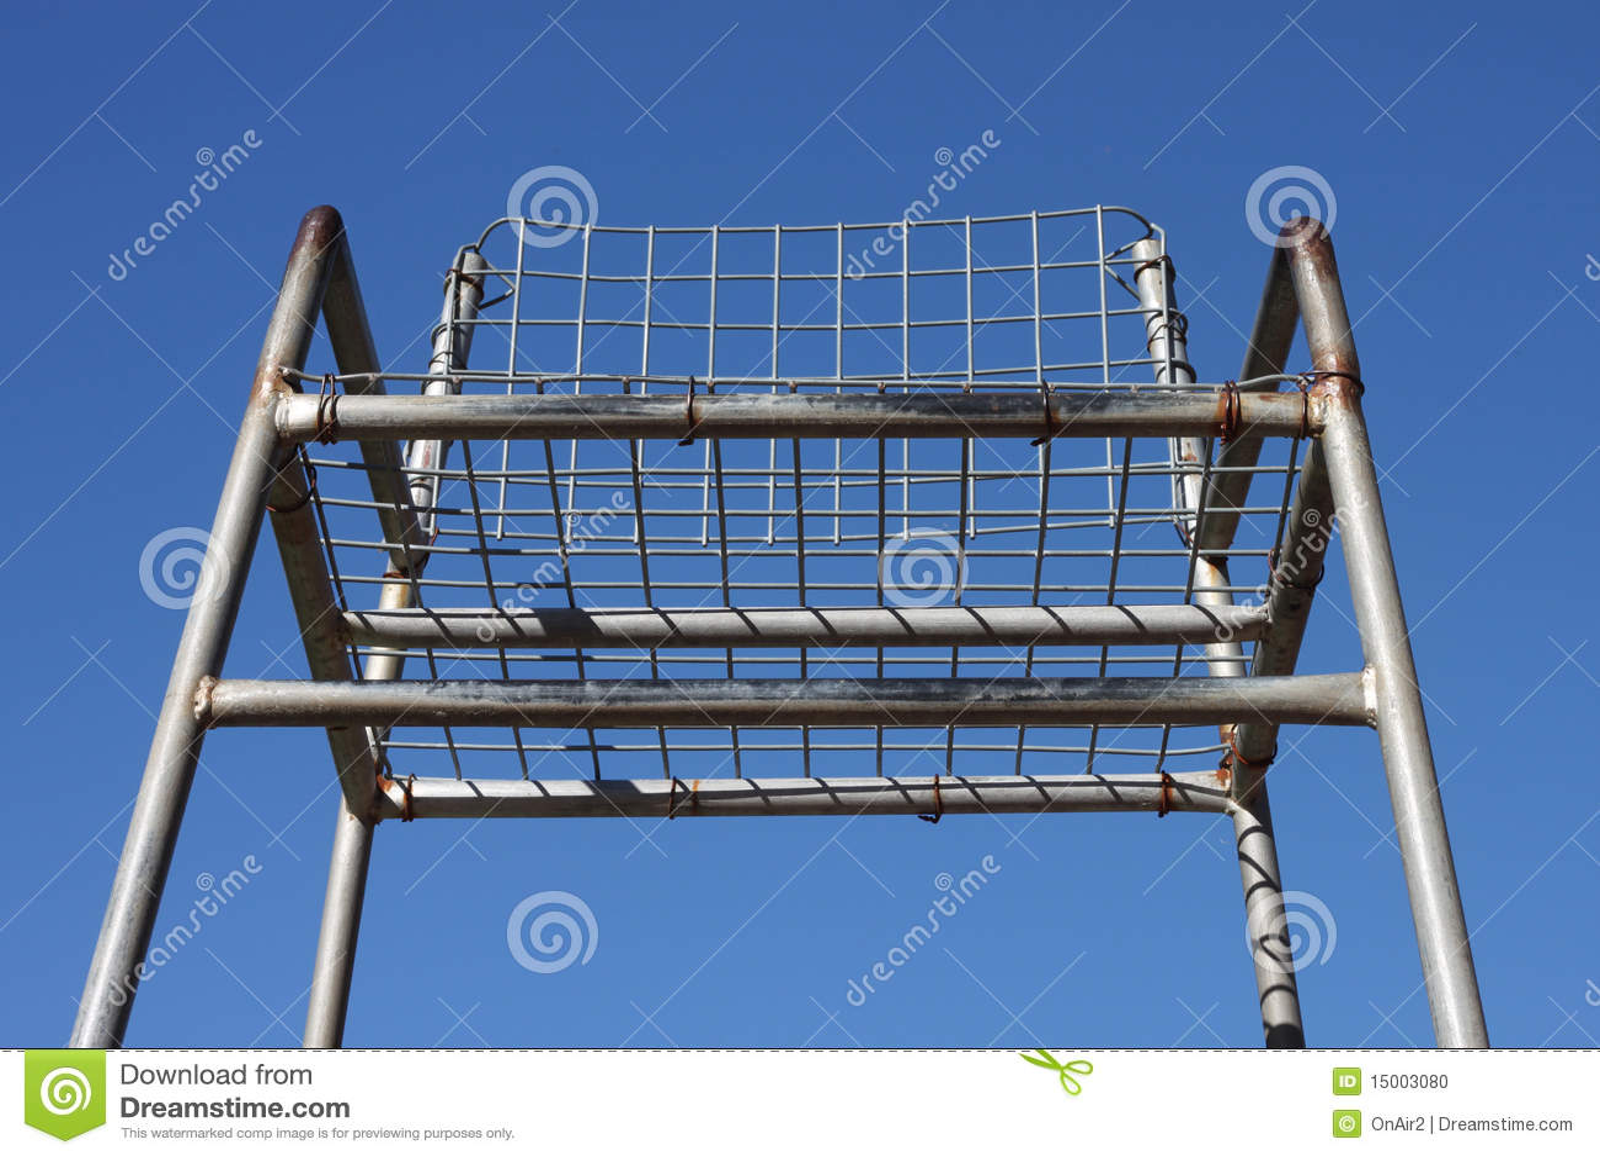 tennis umpire chair hire ikea gregor stock photo image of judge